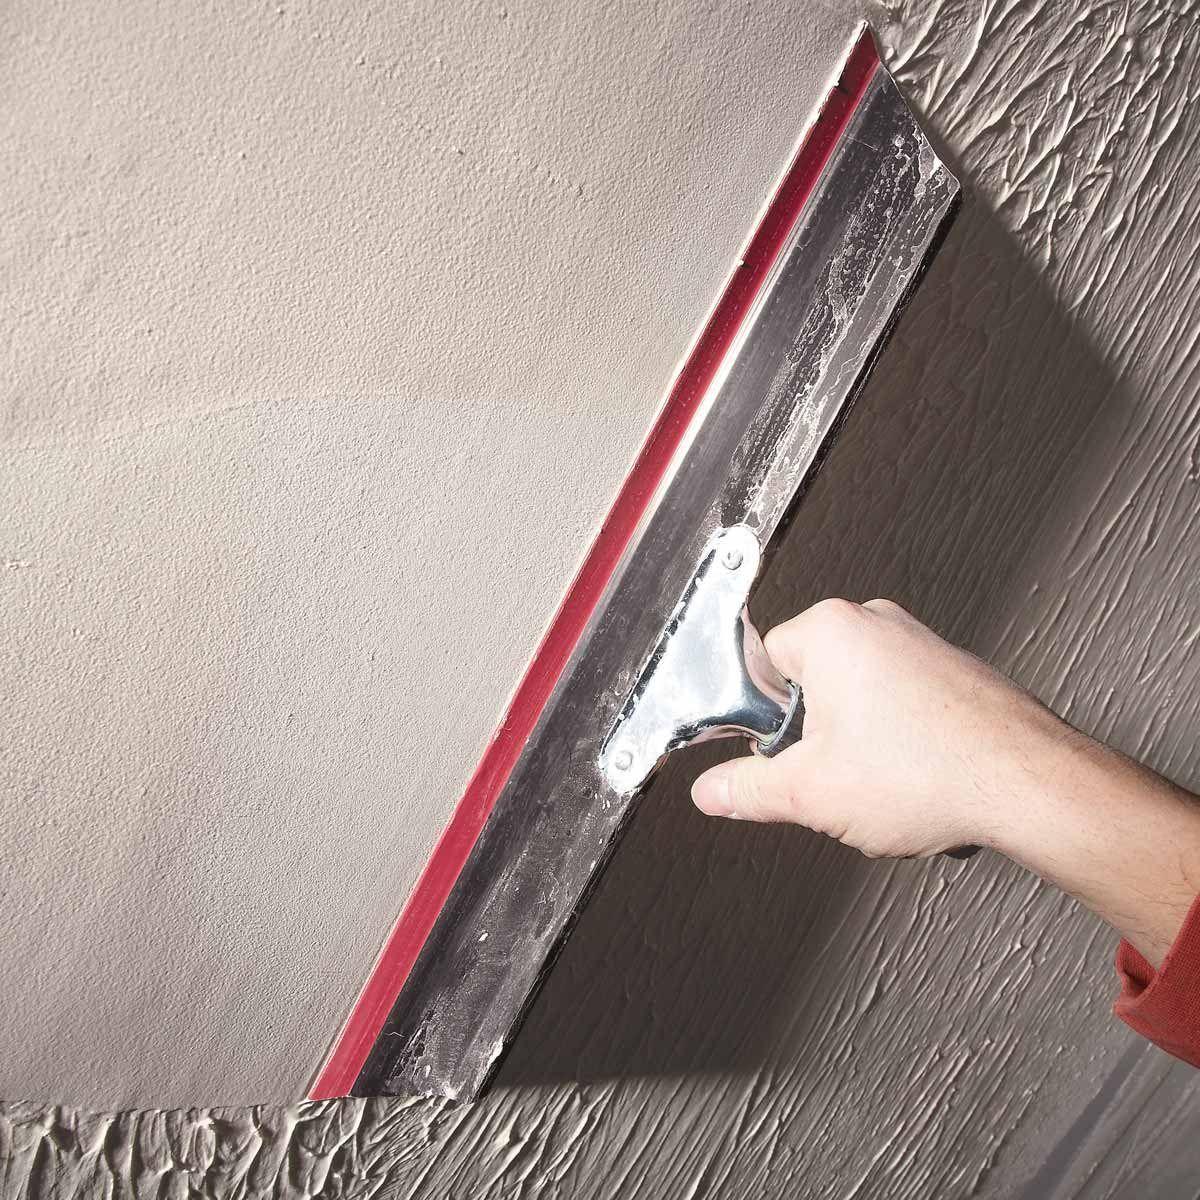 How To Skim Coat Walls In 2020 Drywall Installation Skim Coating Wall